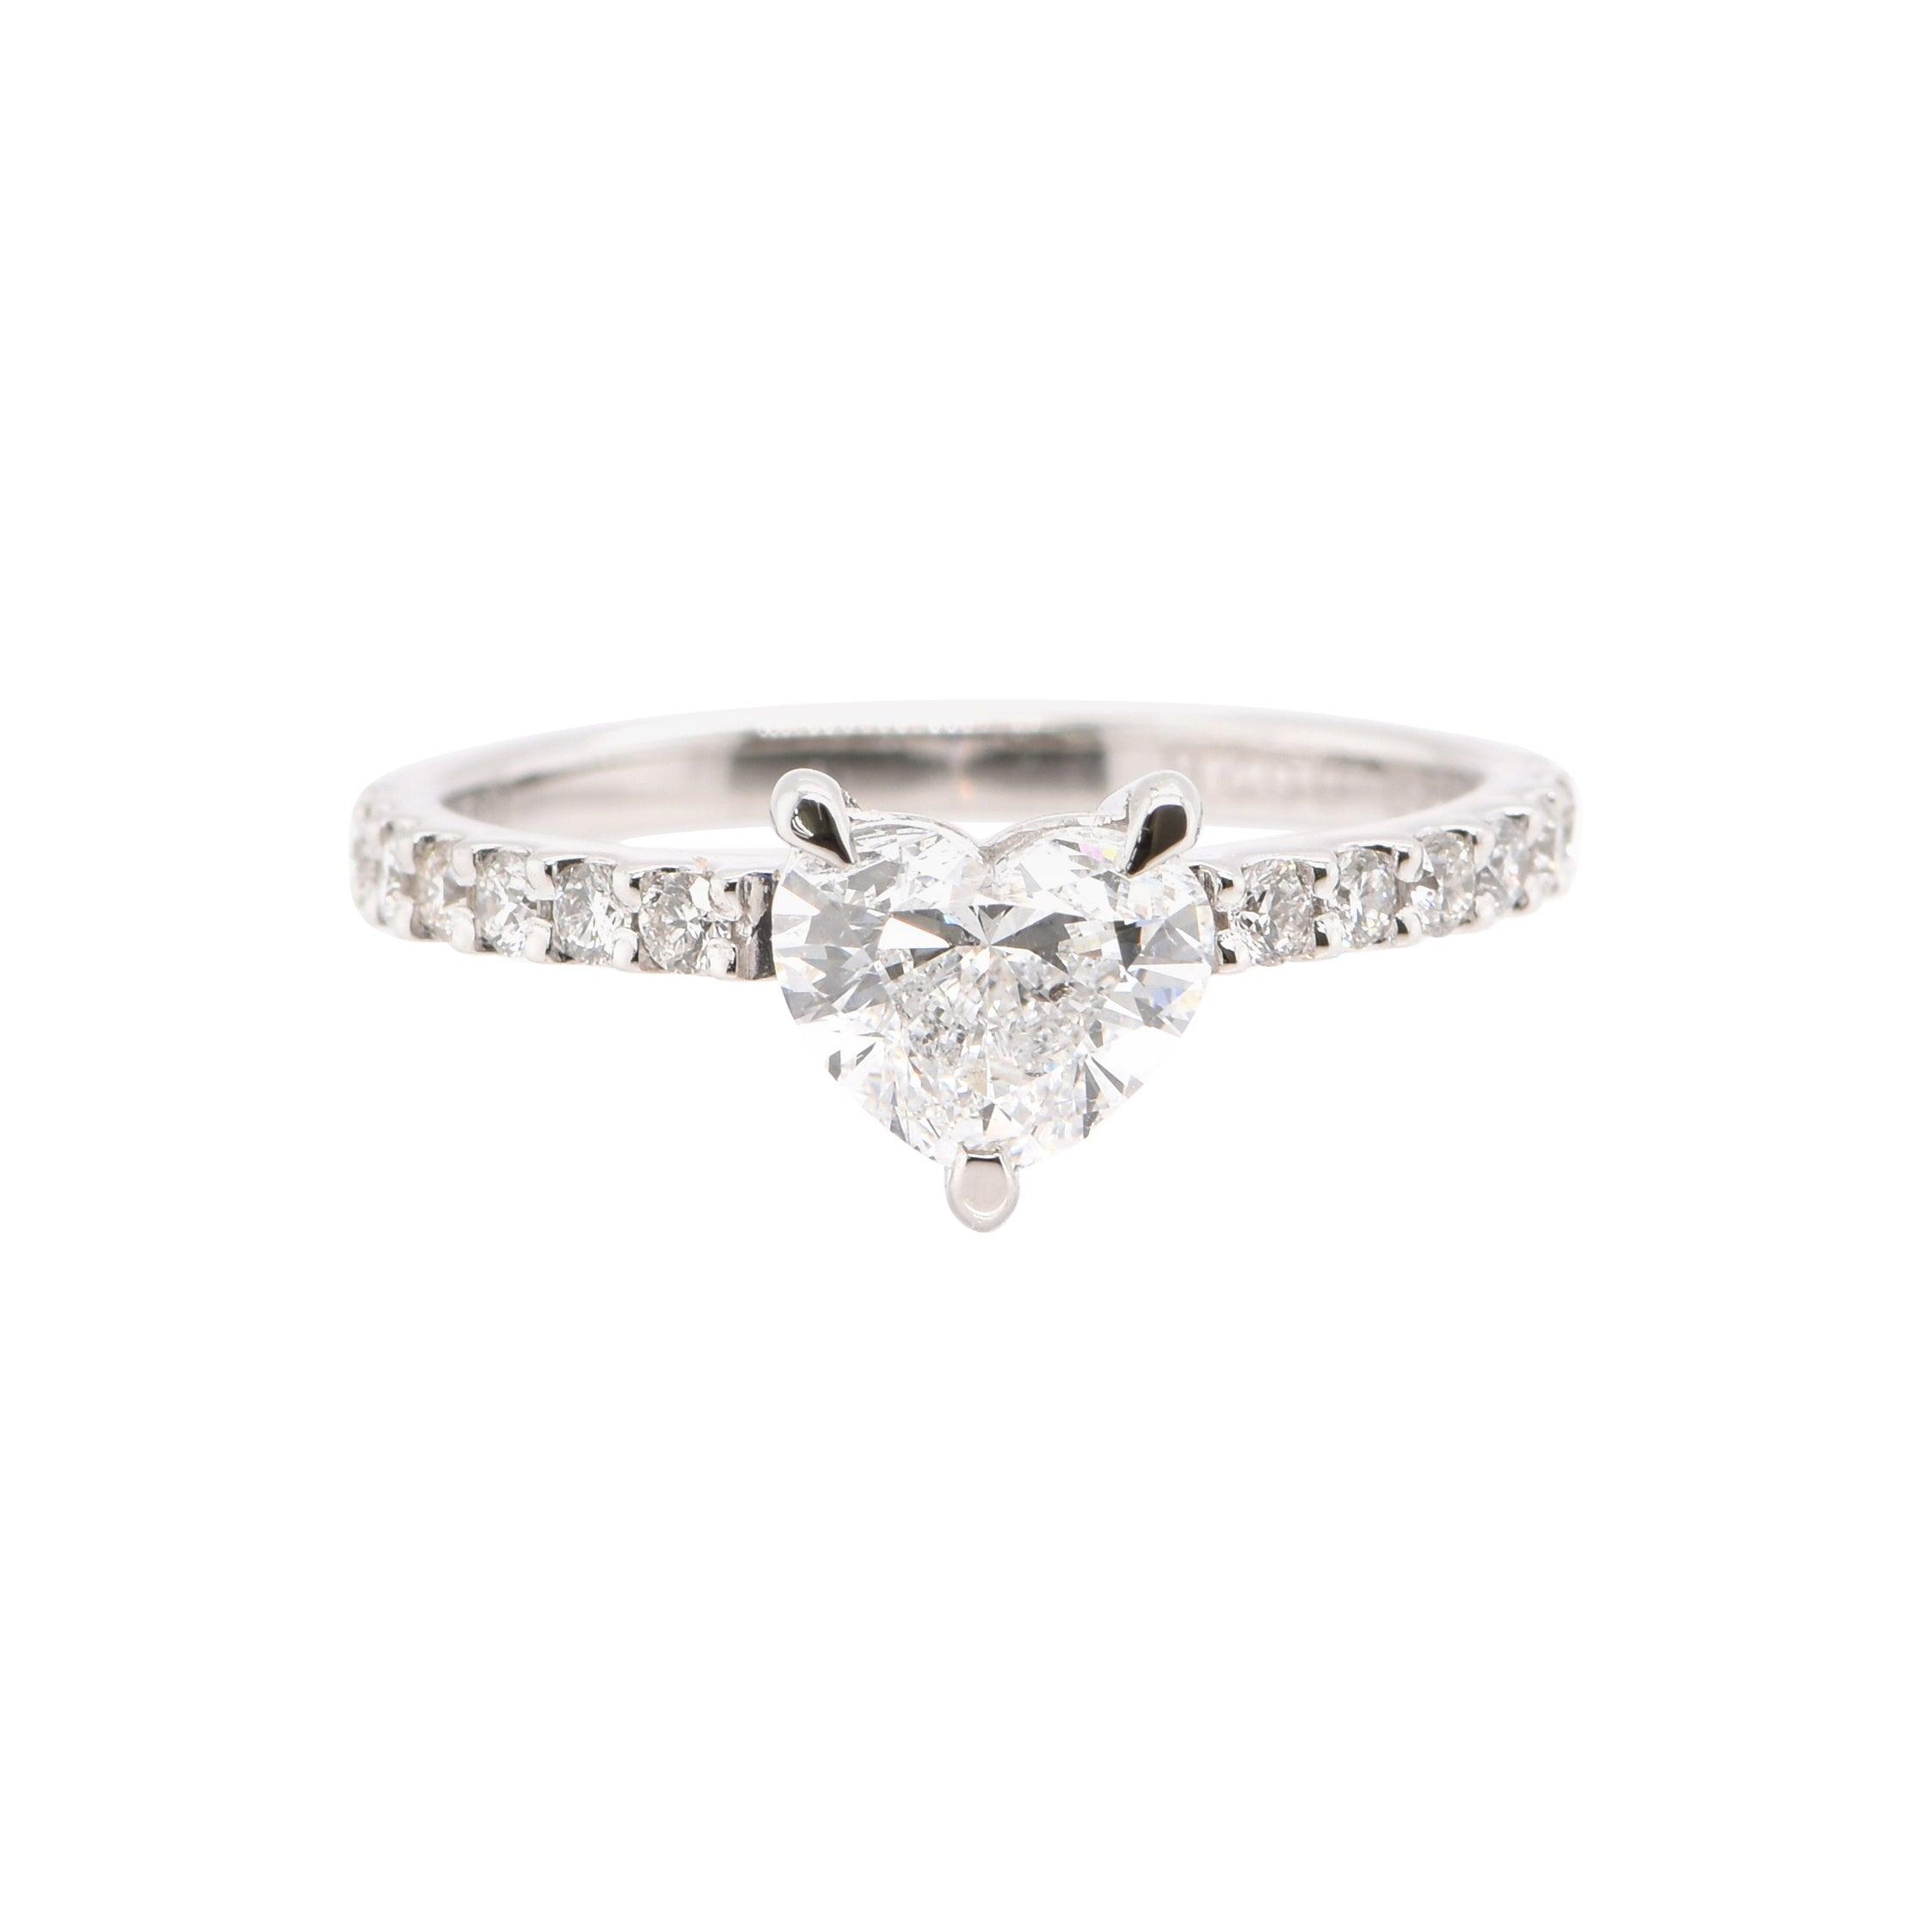 1.01 Carat, H SI-2 Natural Diamond Solitaire Ring Set in Platinum